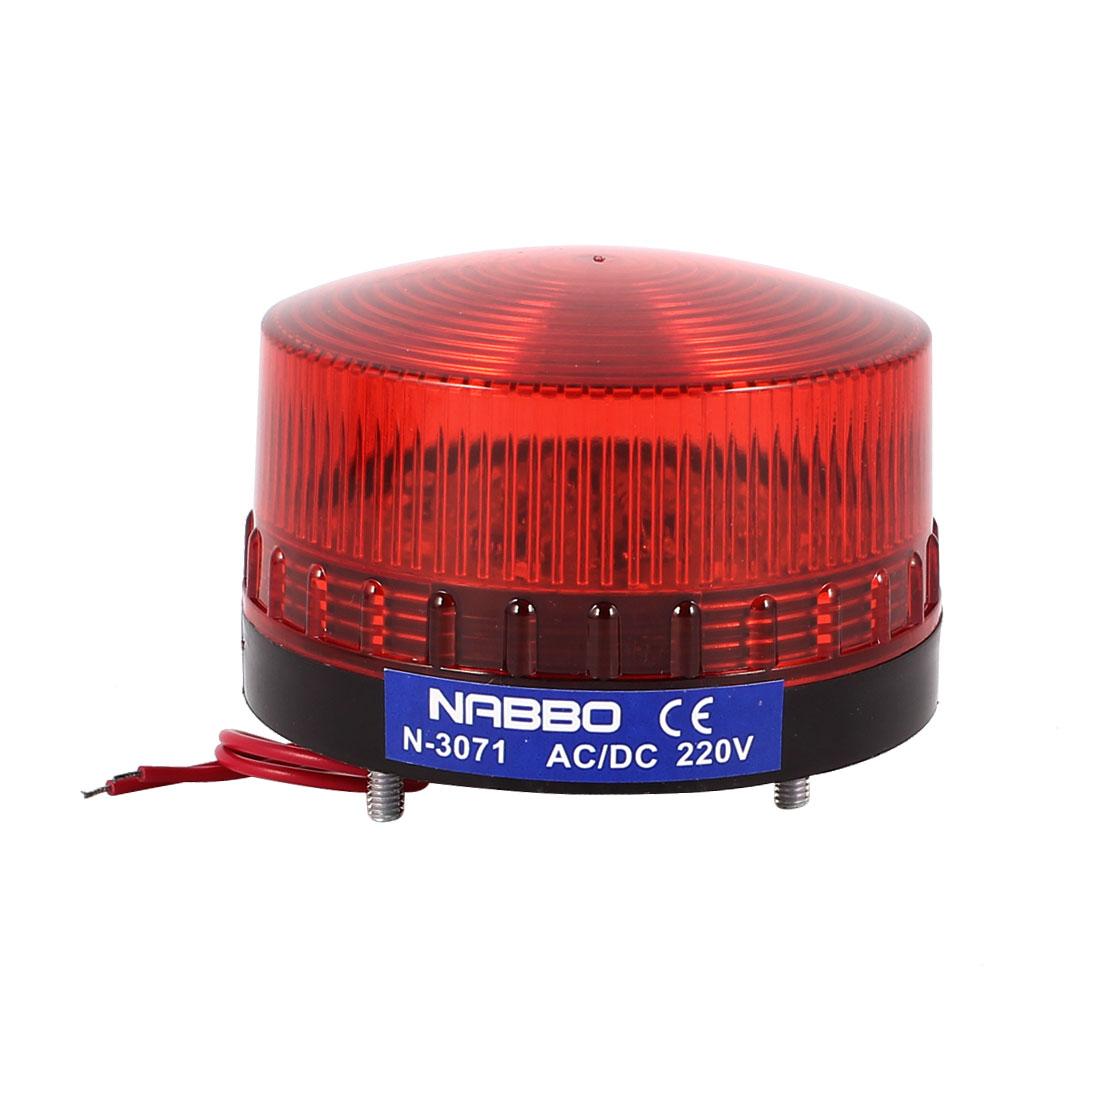 Industrial AC 220V Red LED Blinking Warning Light Bulb Signal Tower Lamp N-3071